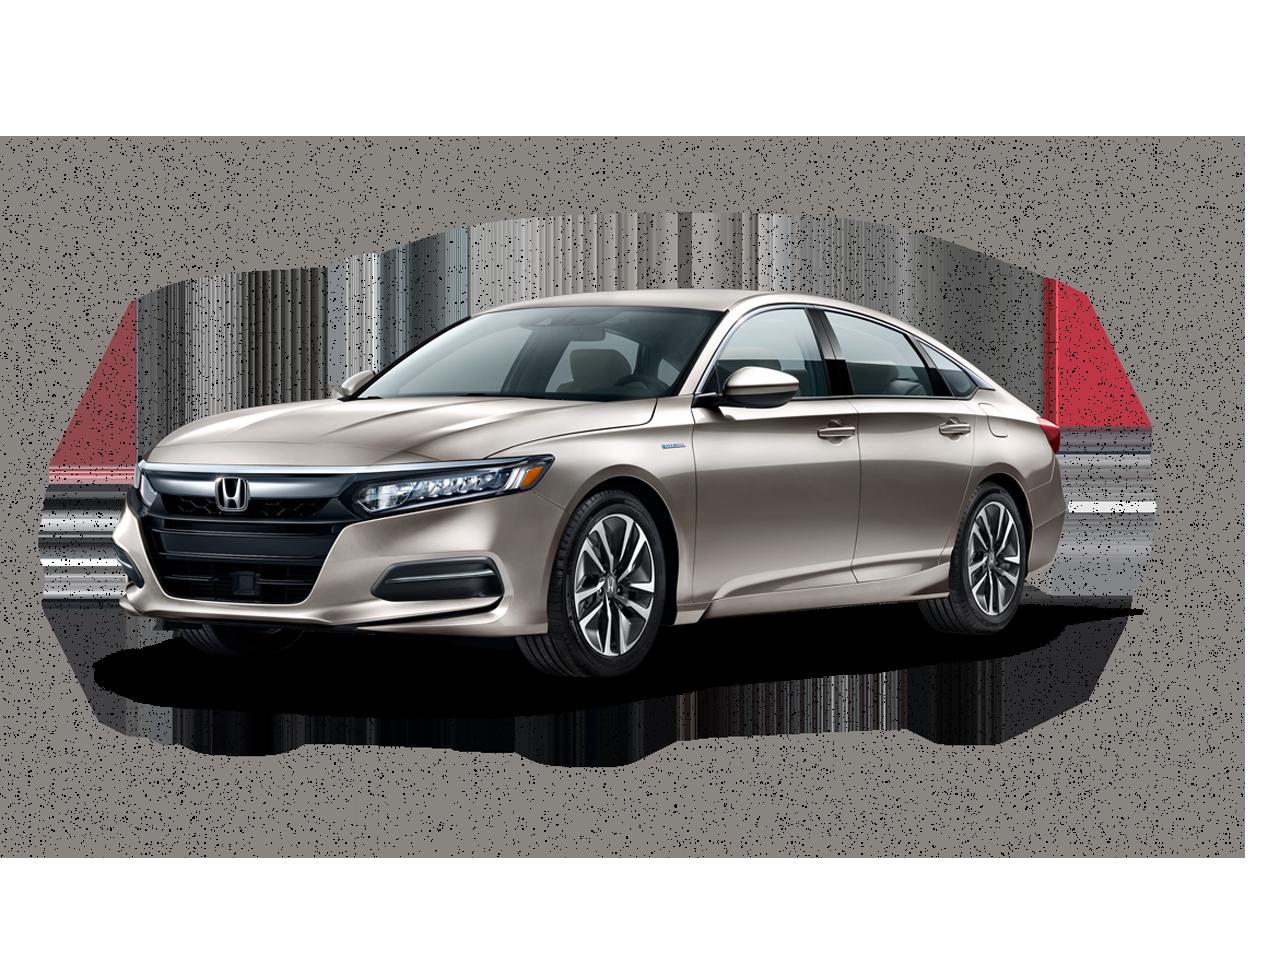 2019 Accord Hybrid LX